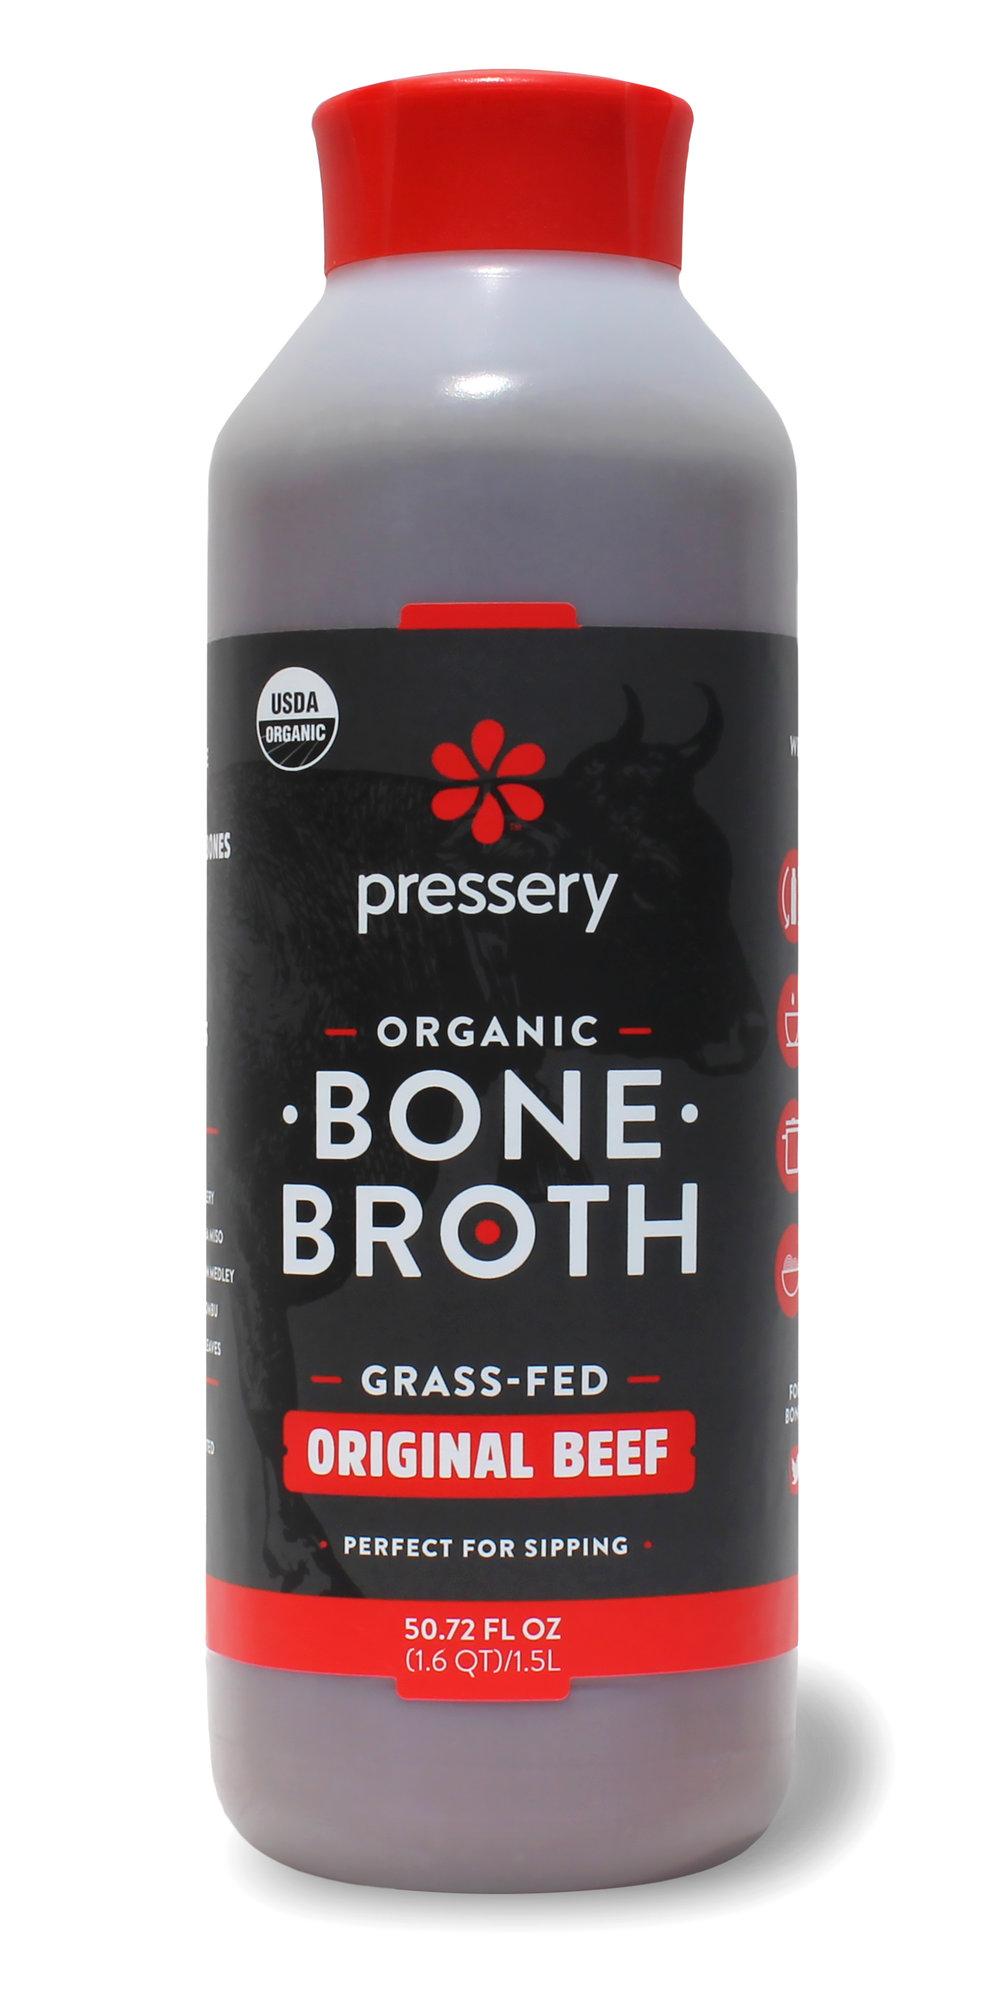 ORIGINAL BEEF - CERTIFIED USDA ORGANIC, MADE WITH GRASS-FED BEEF BONES